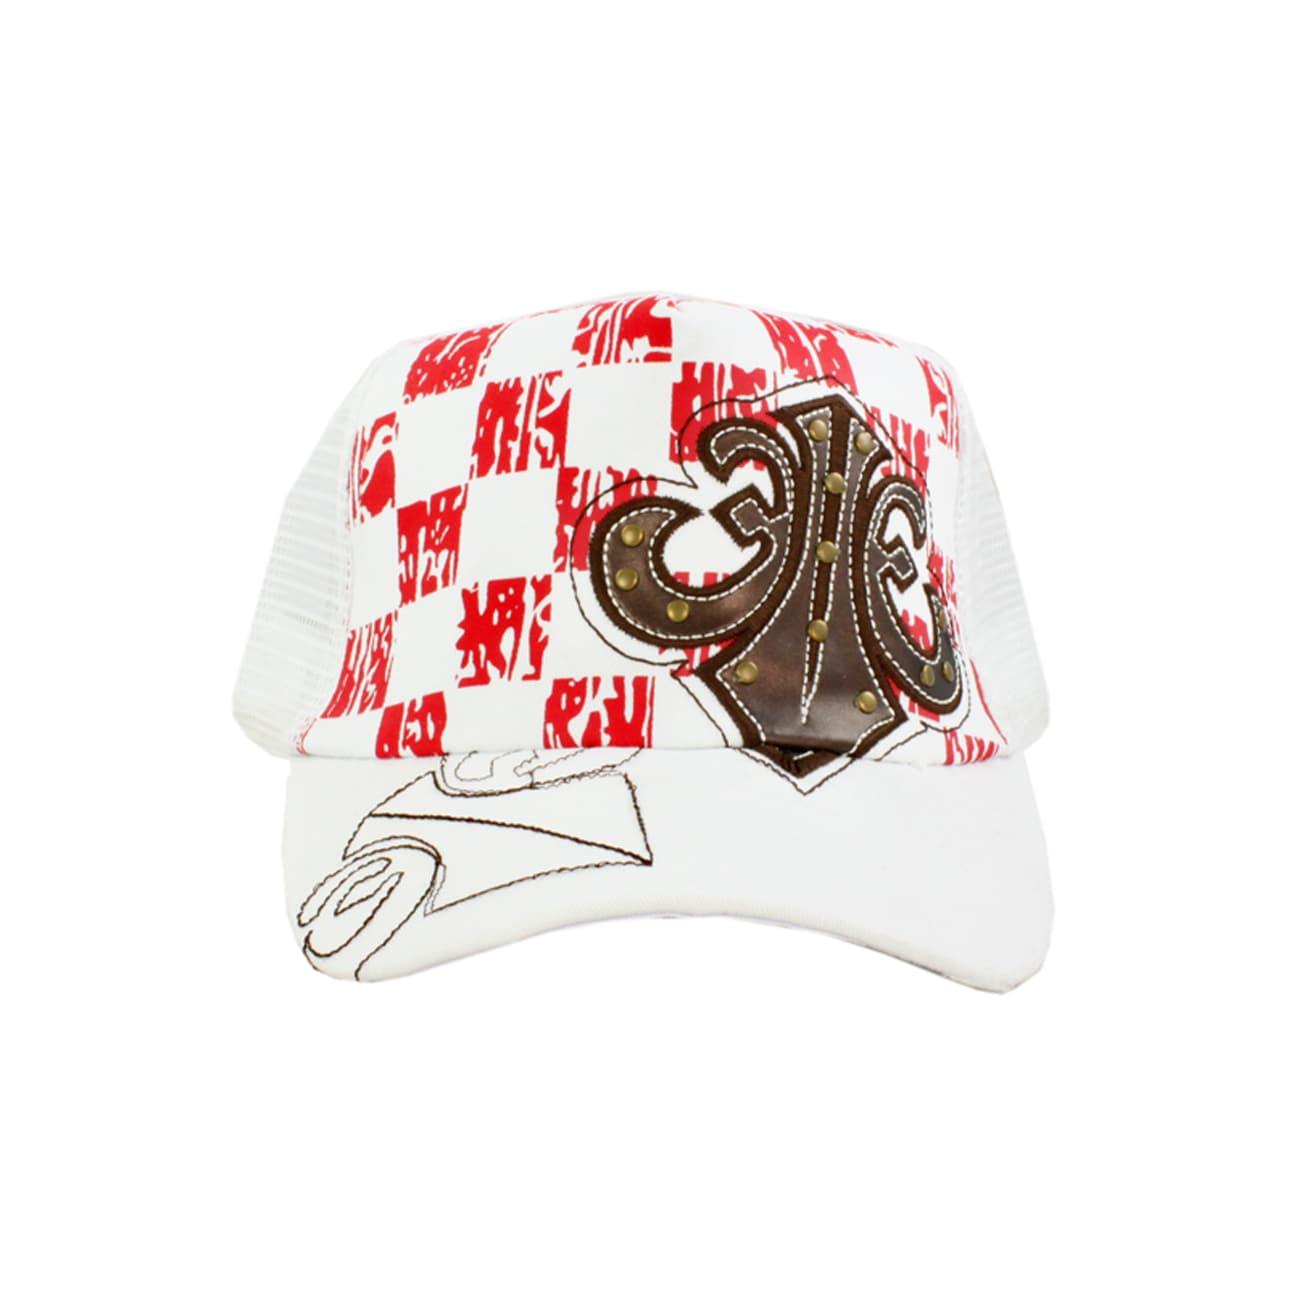 Faddism Unisex White Red Square Design Baseball Cap